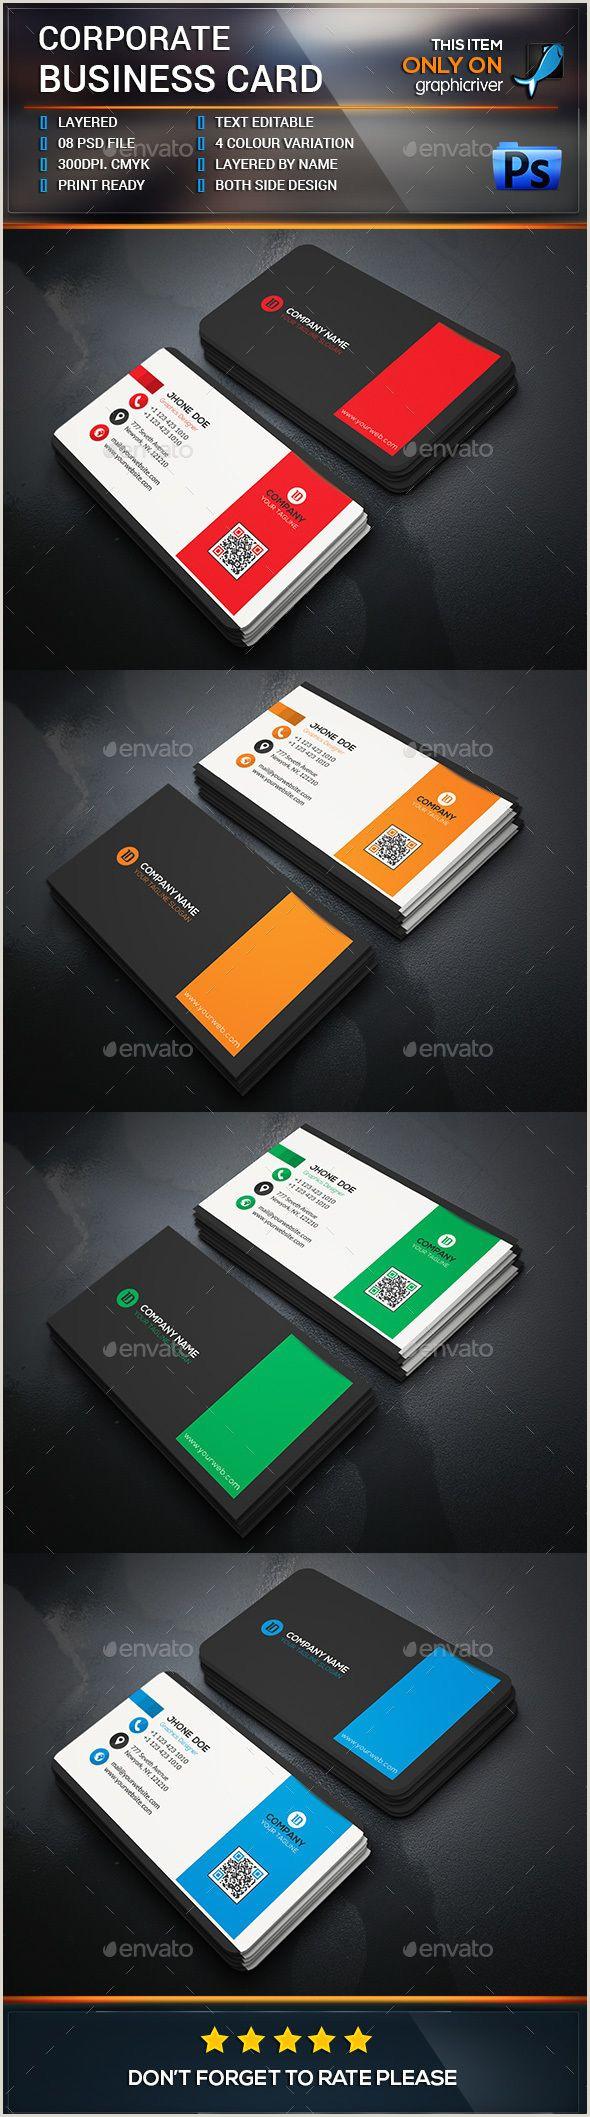 Business Card Branding Corporate Business Card Template